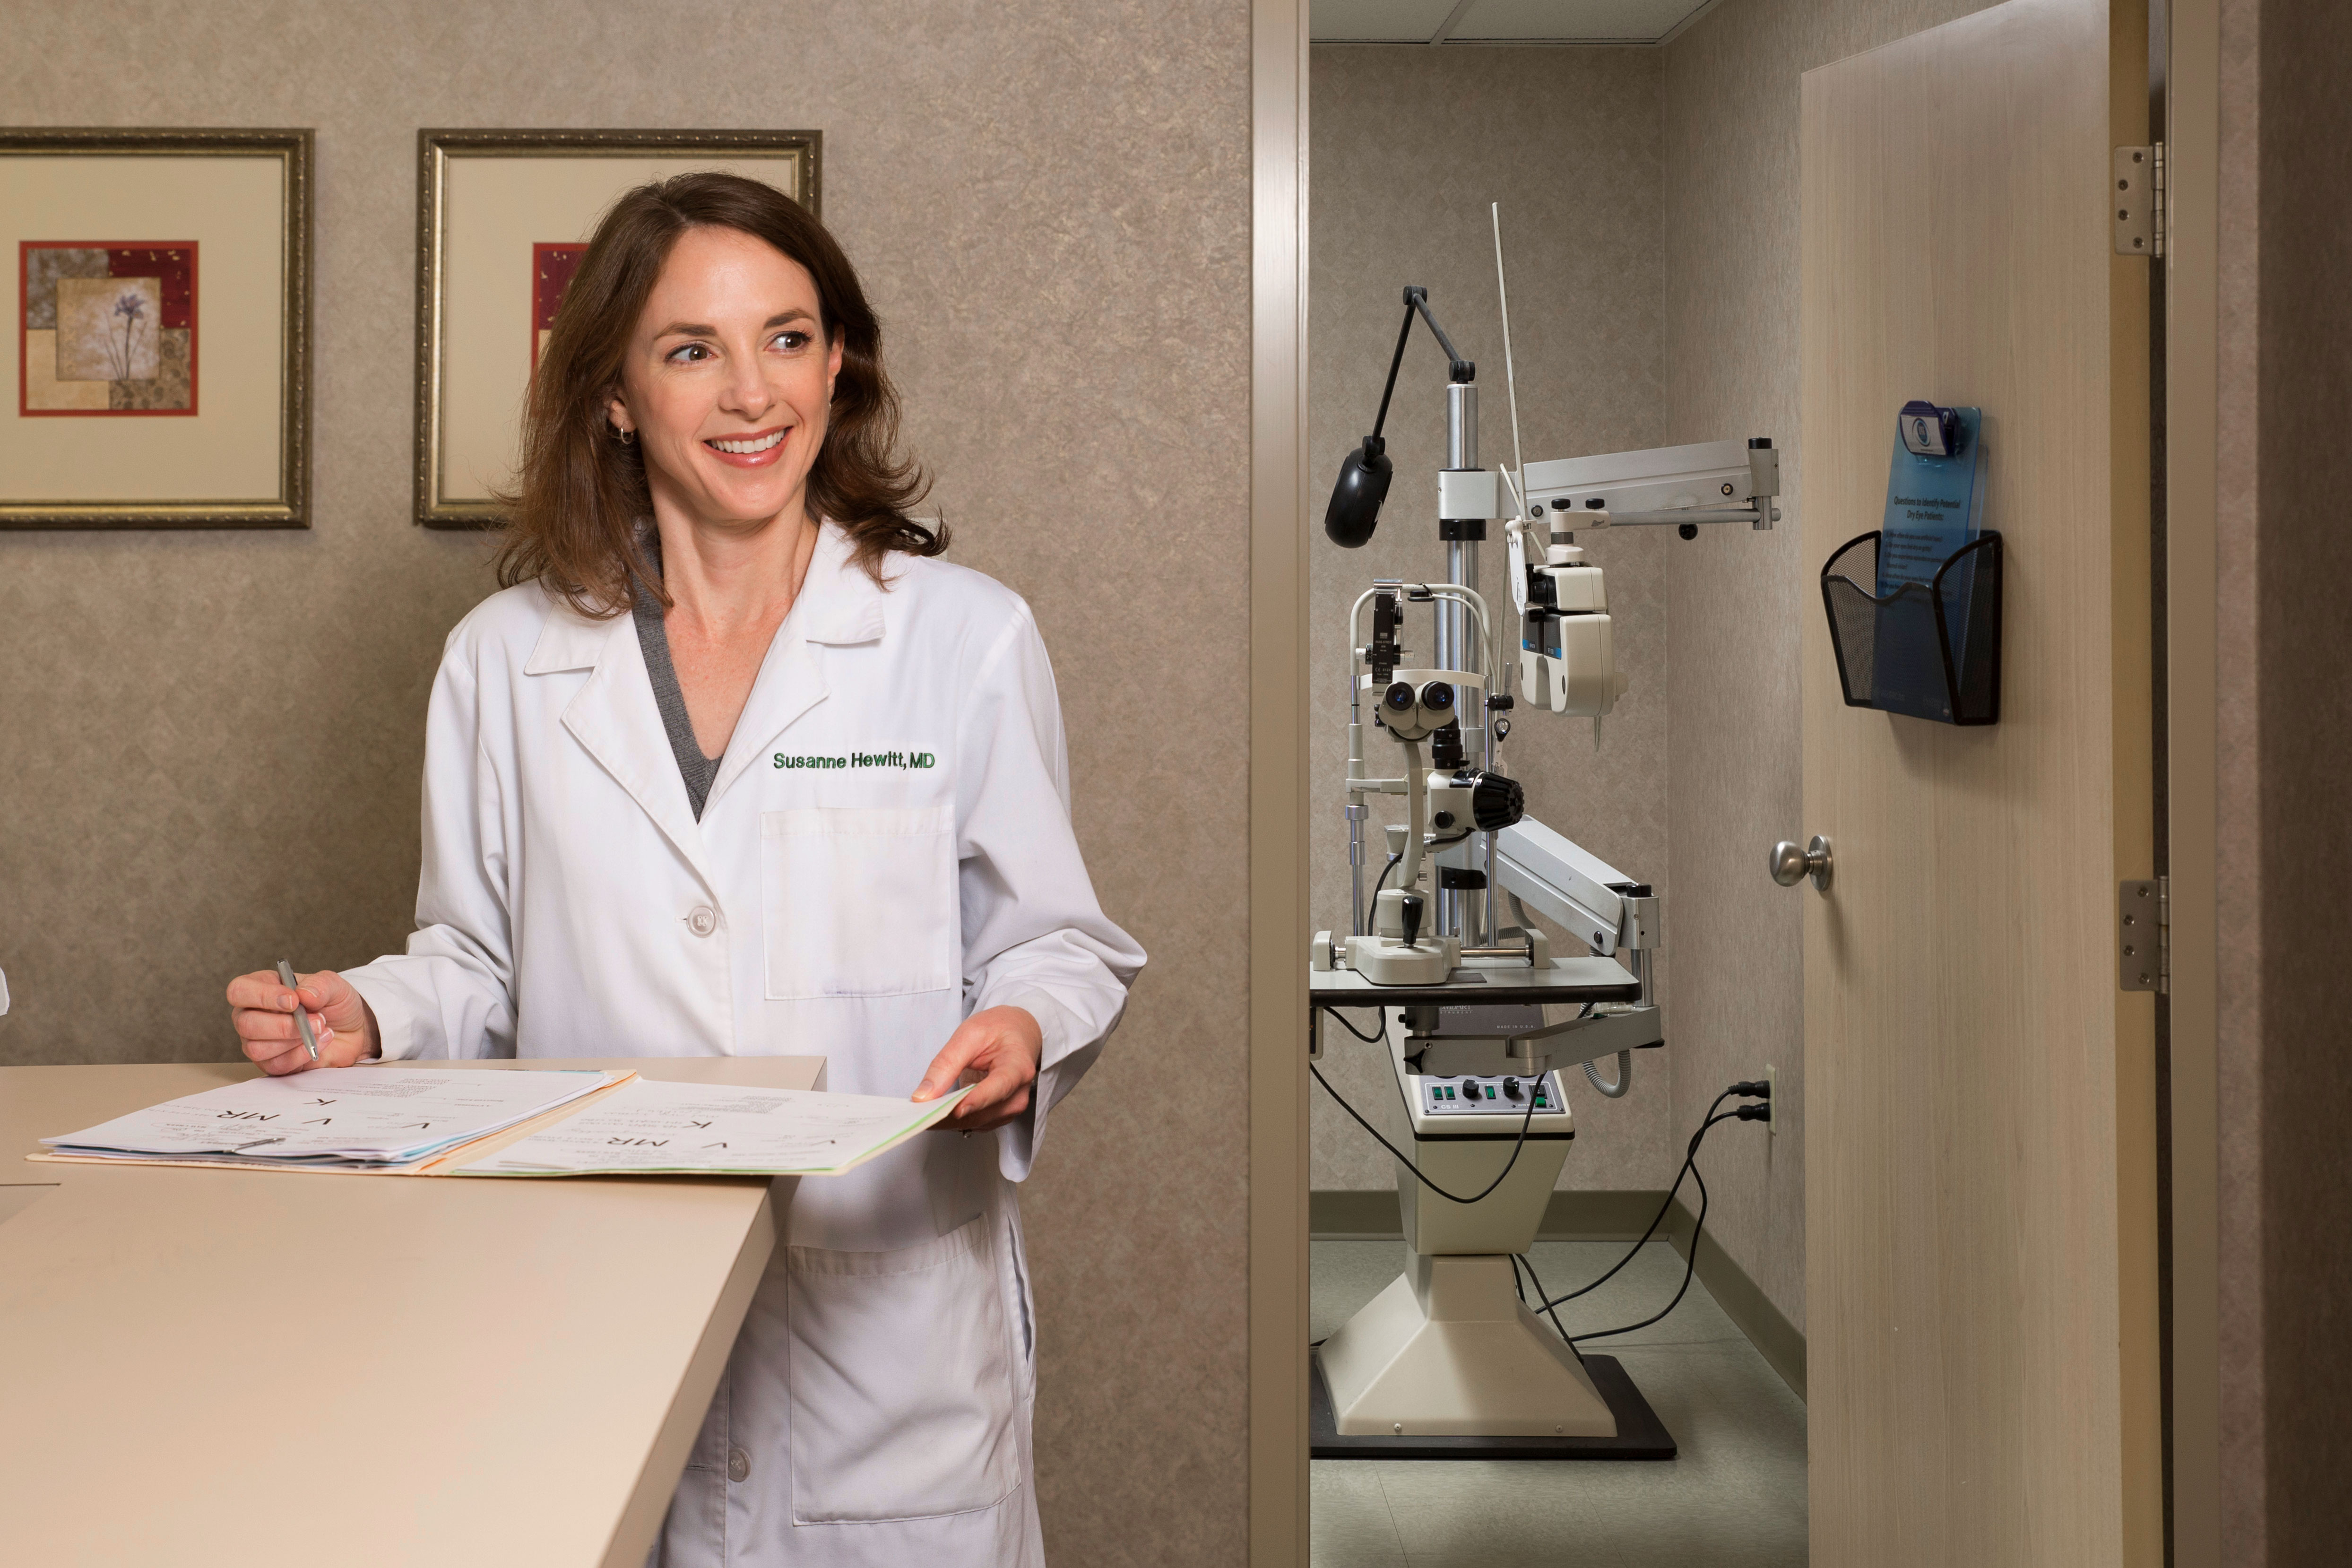 Eye Dr. Hewitt